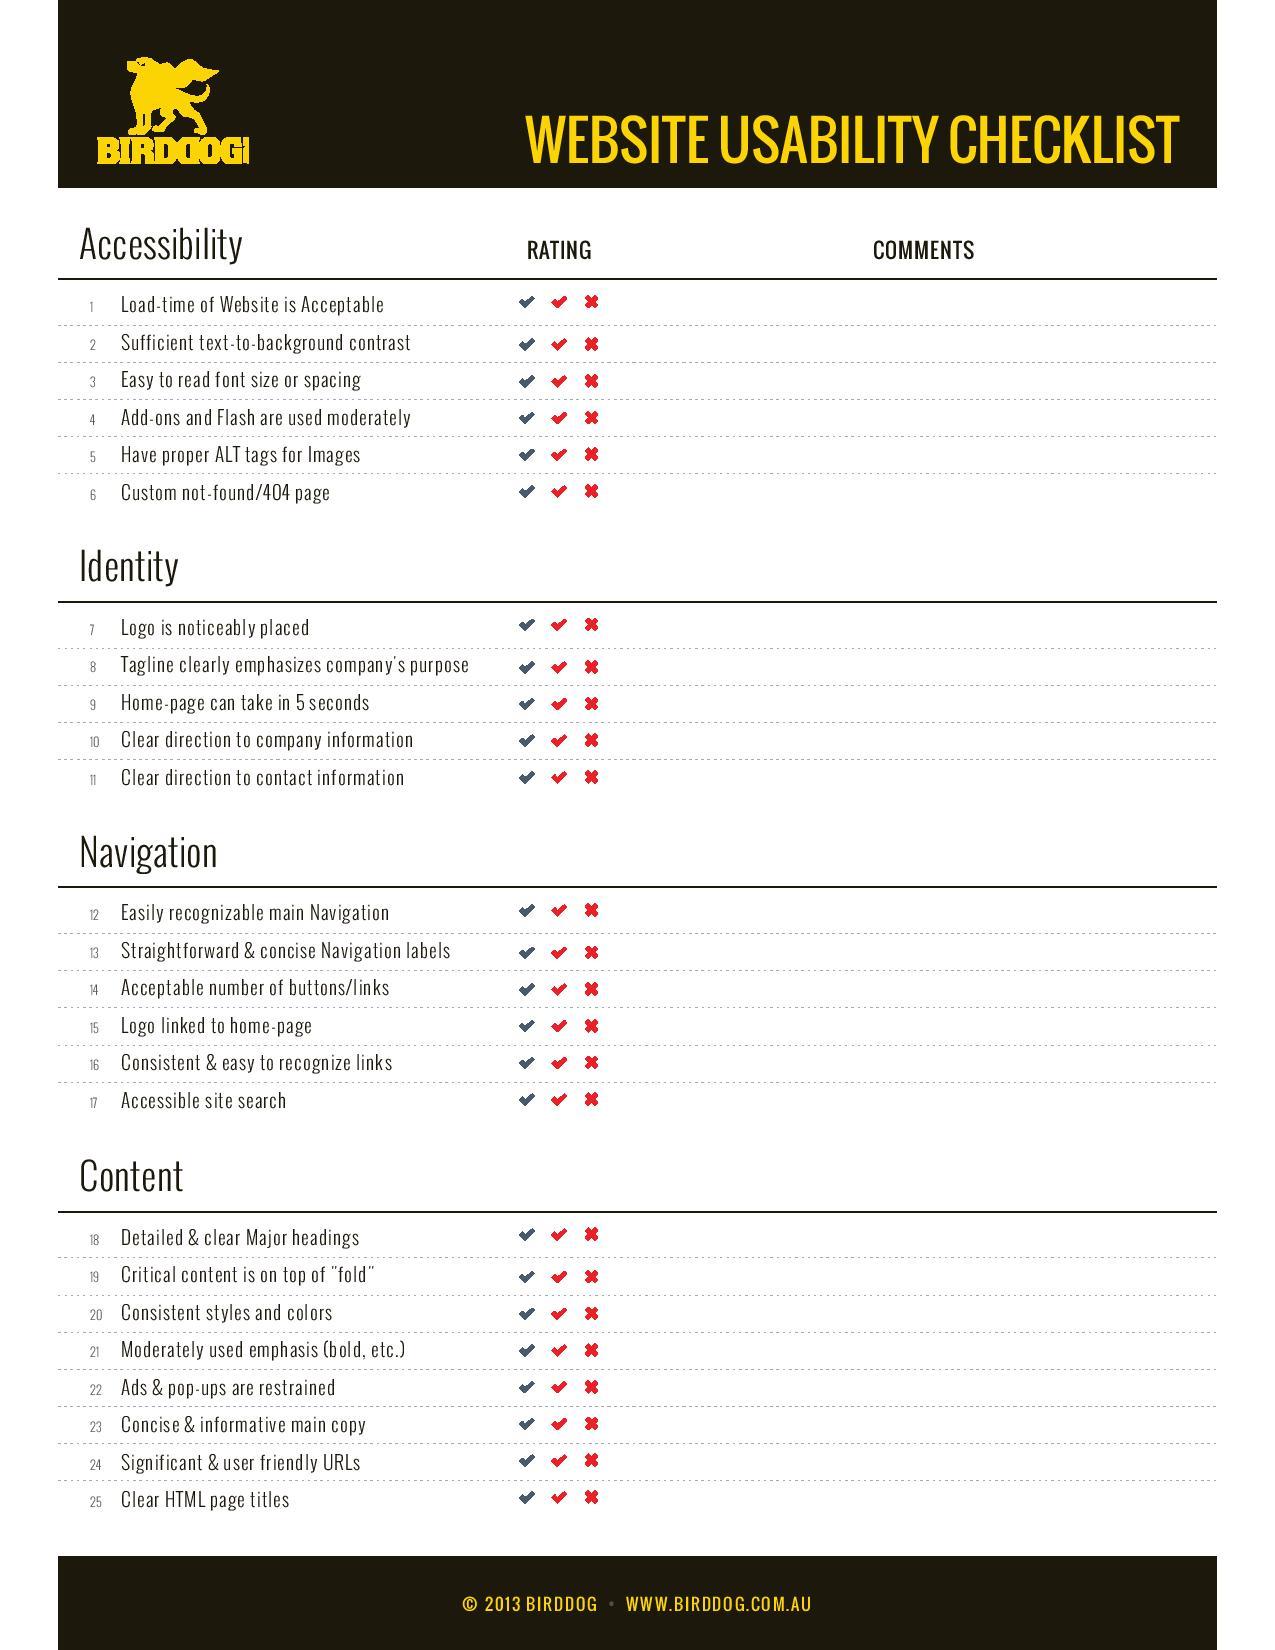 usability_checklist